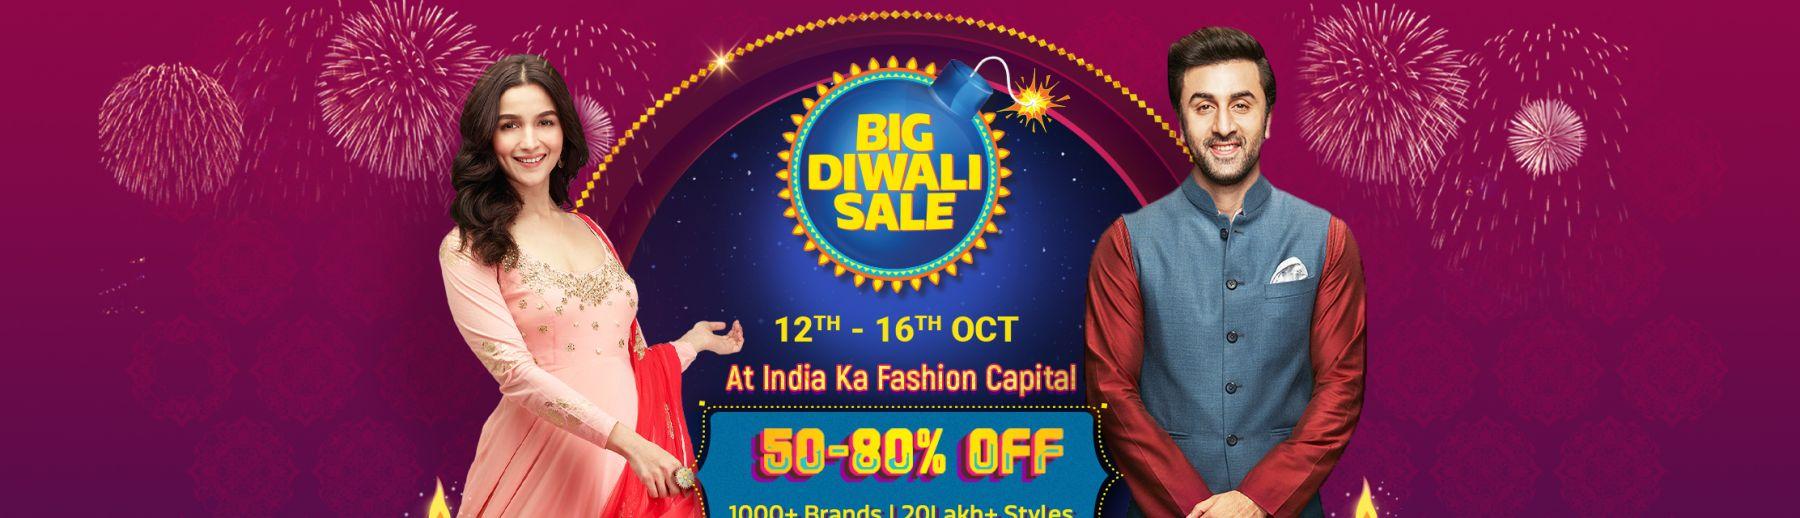 Flipkart-Big-Diwali-Sale-Fashion-Upto-90OFF-2019